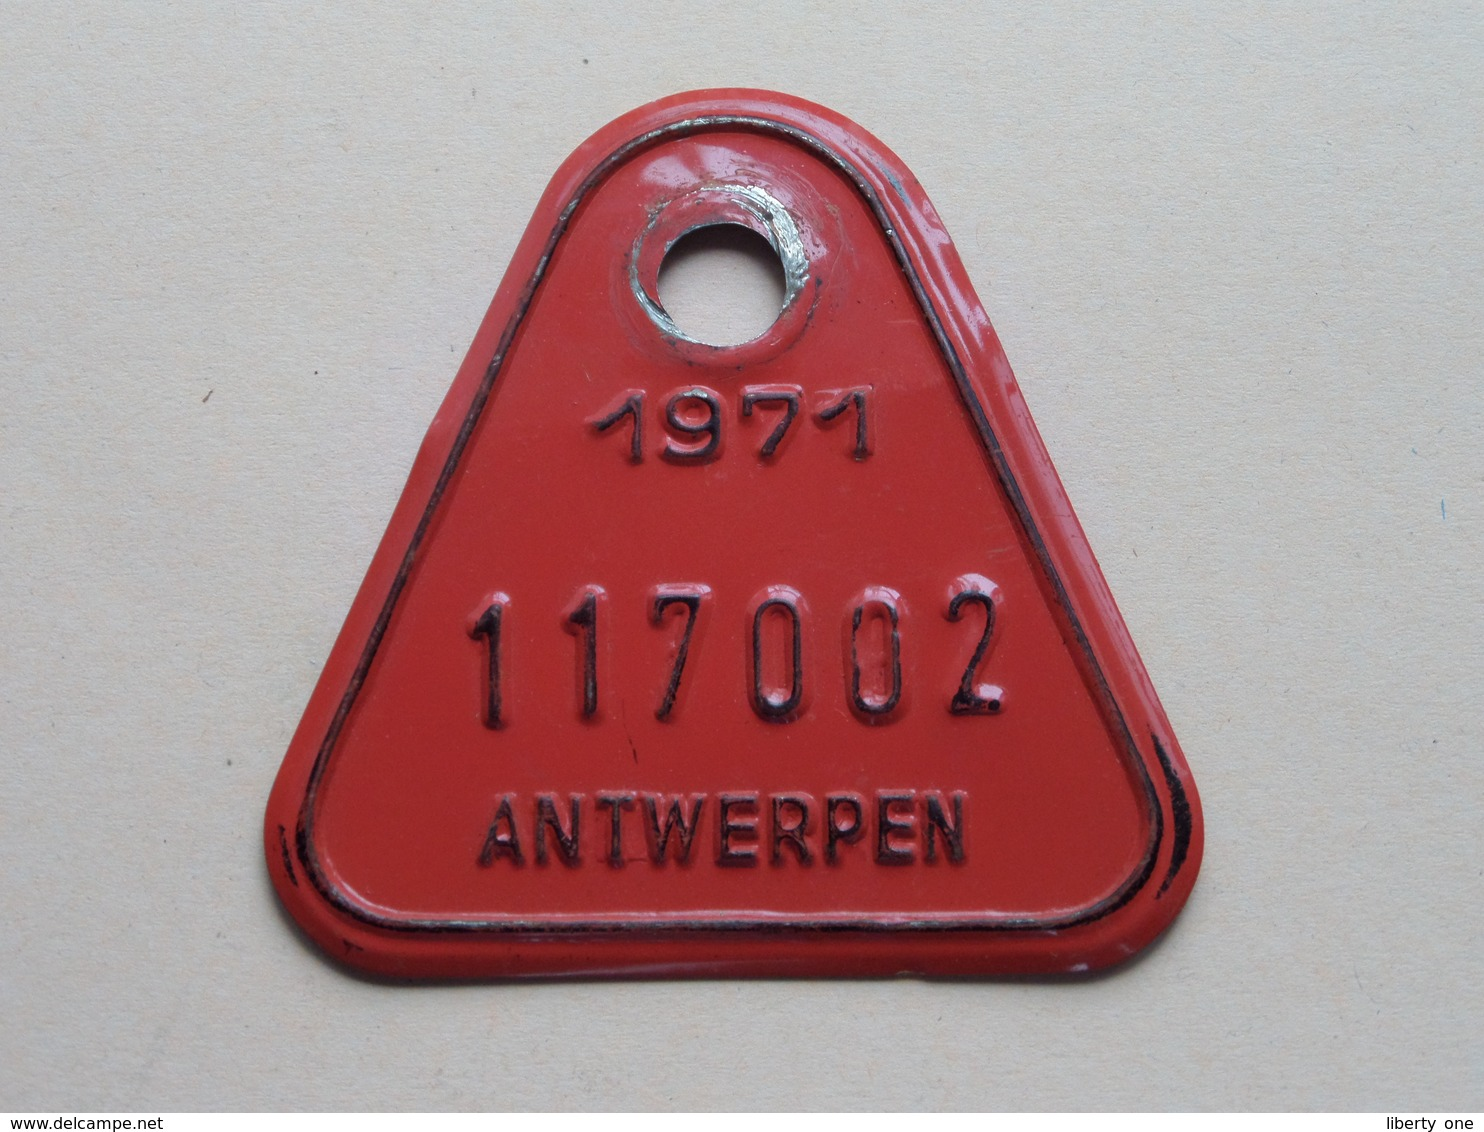 FIETSPLAAT / PLAQUE Vélo ( Antwerpen Nr. 117002 ) Anno 1971 ( België ) ! - Targhe Di Immatricolazione